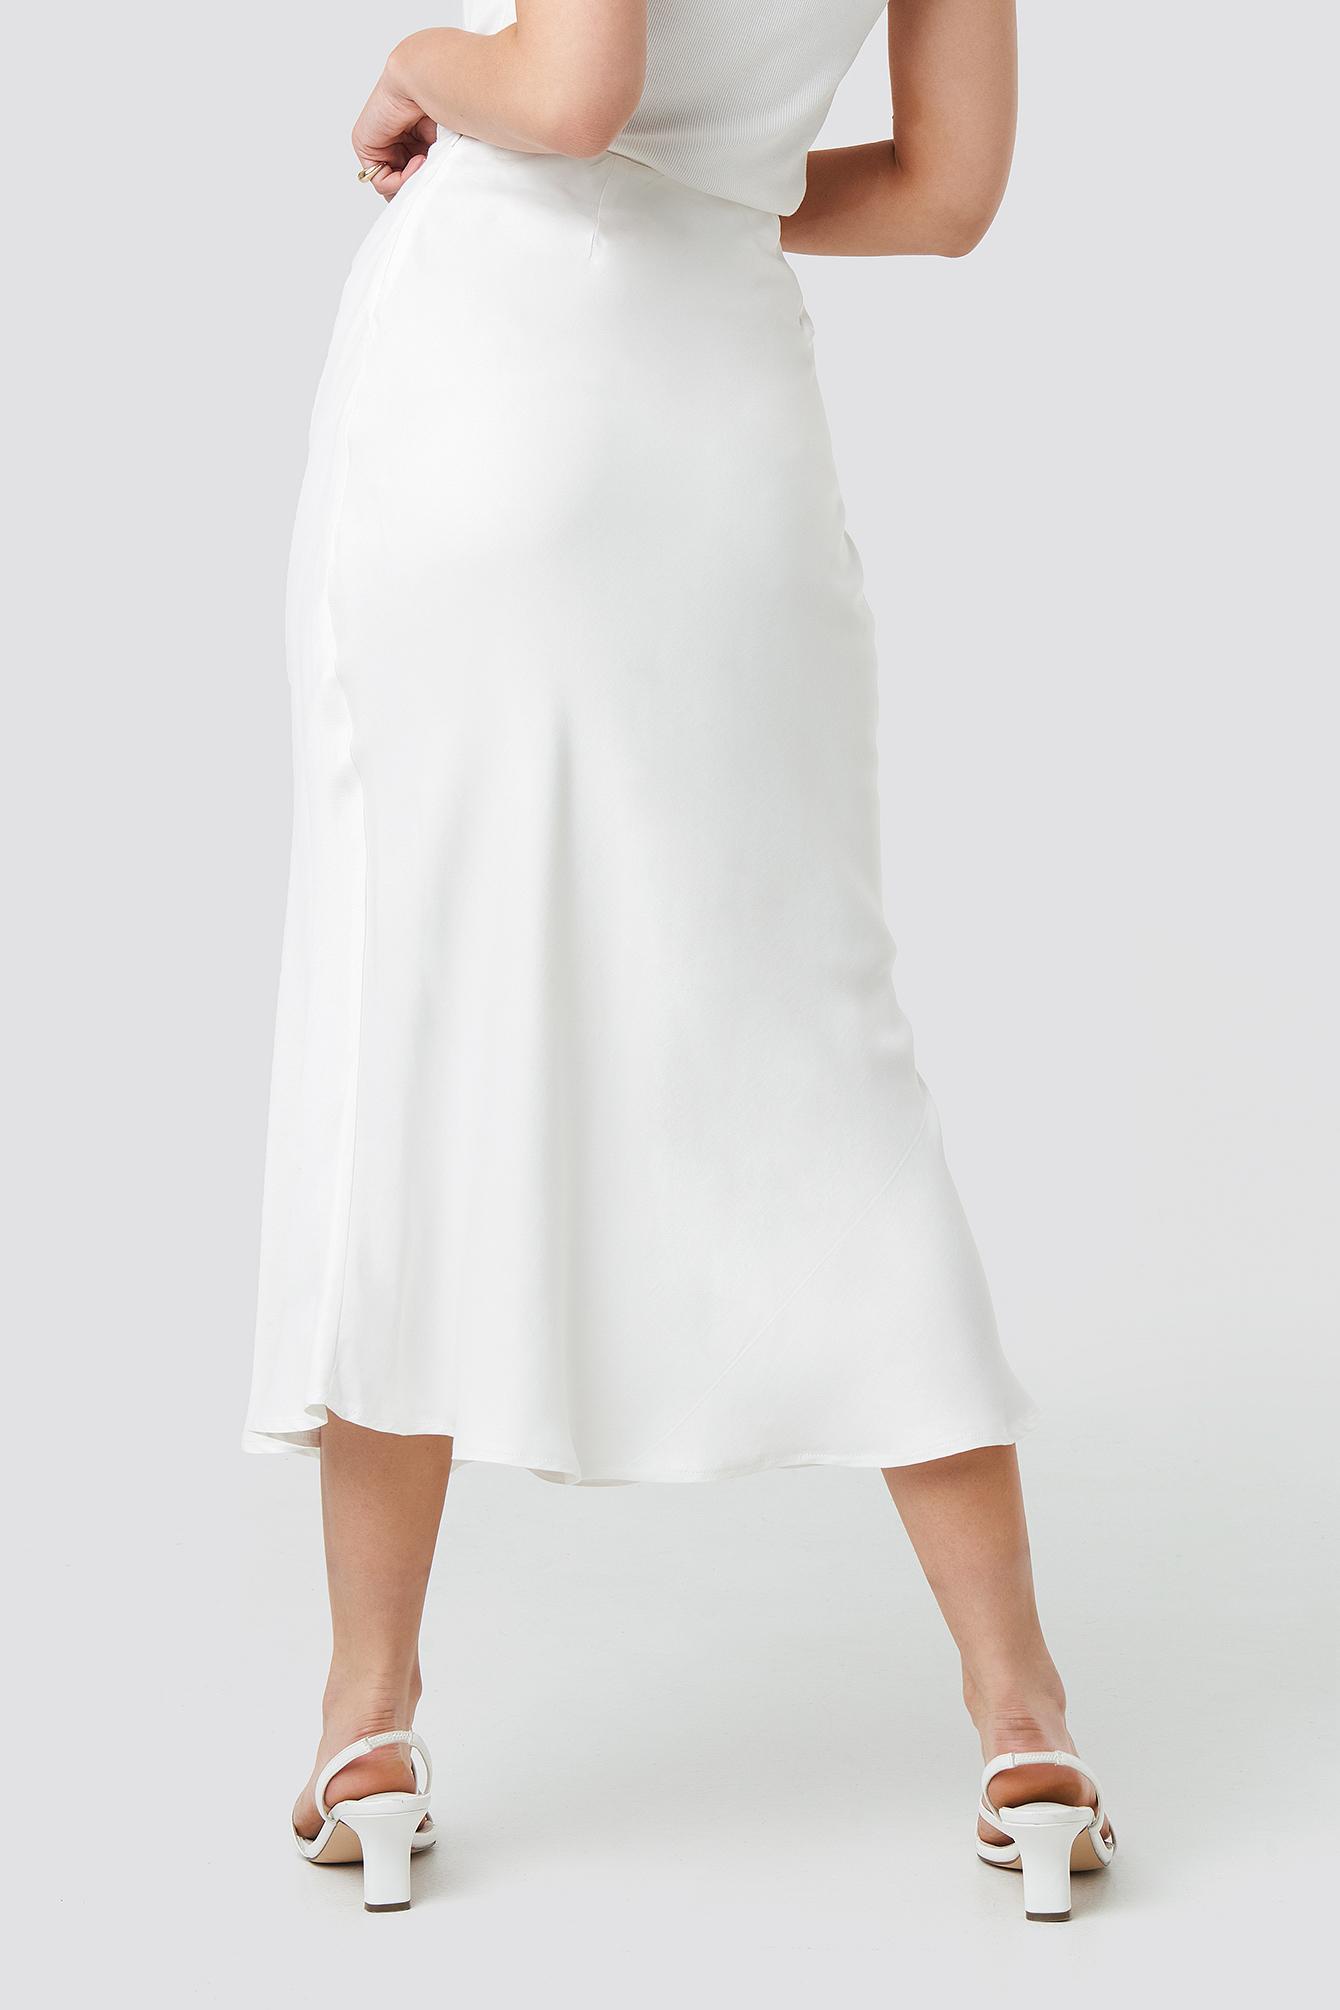 Flywheel Skirt NA-KD.COM